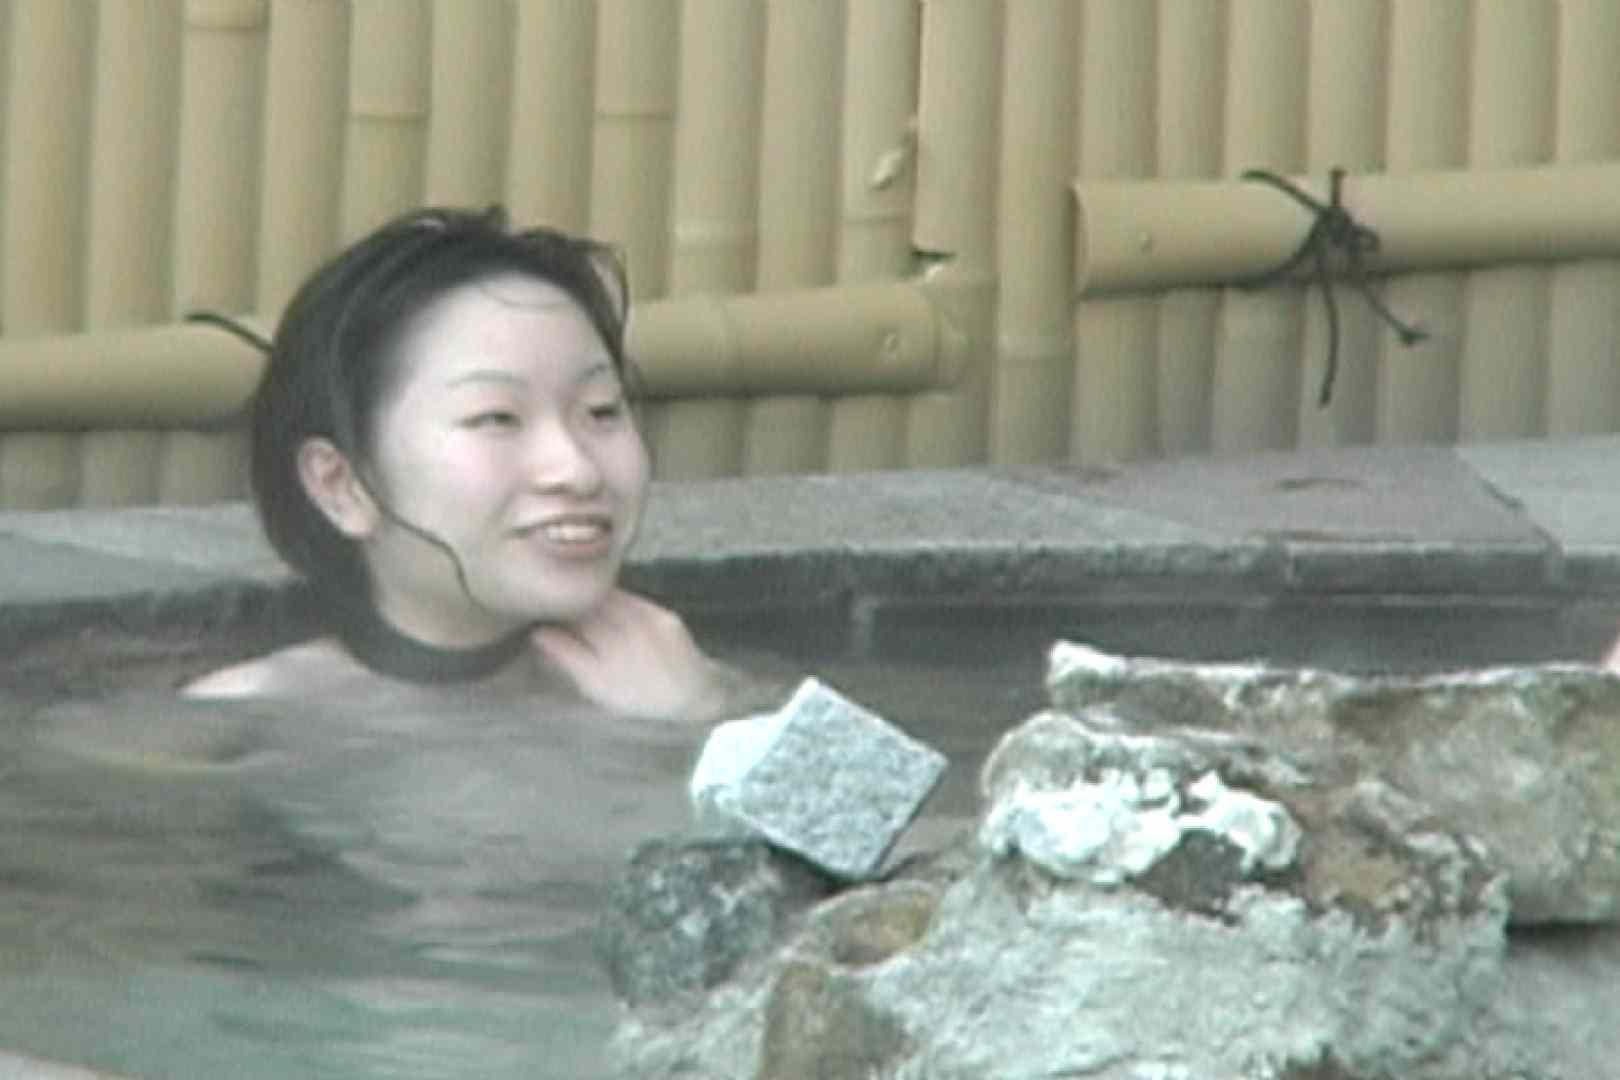 Aquaな露天風呂Vol.595 綺麗なOLたち エロ無料画像 112枚 104